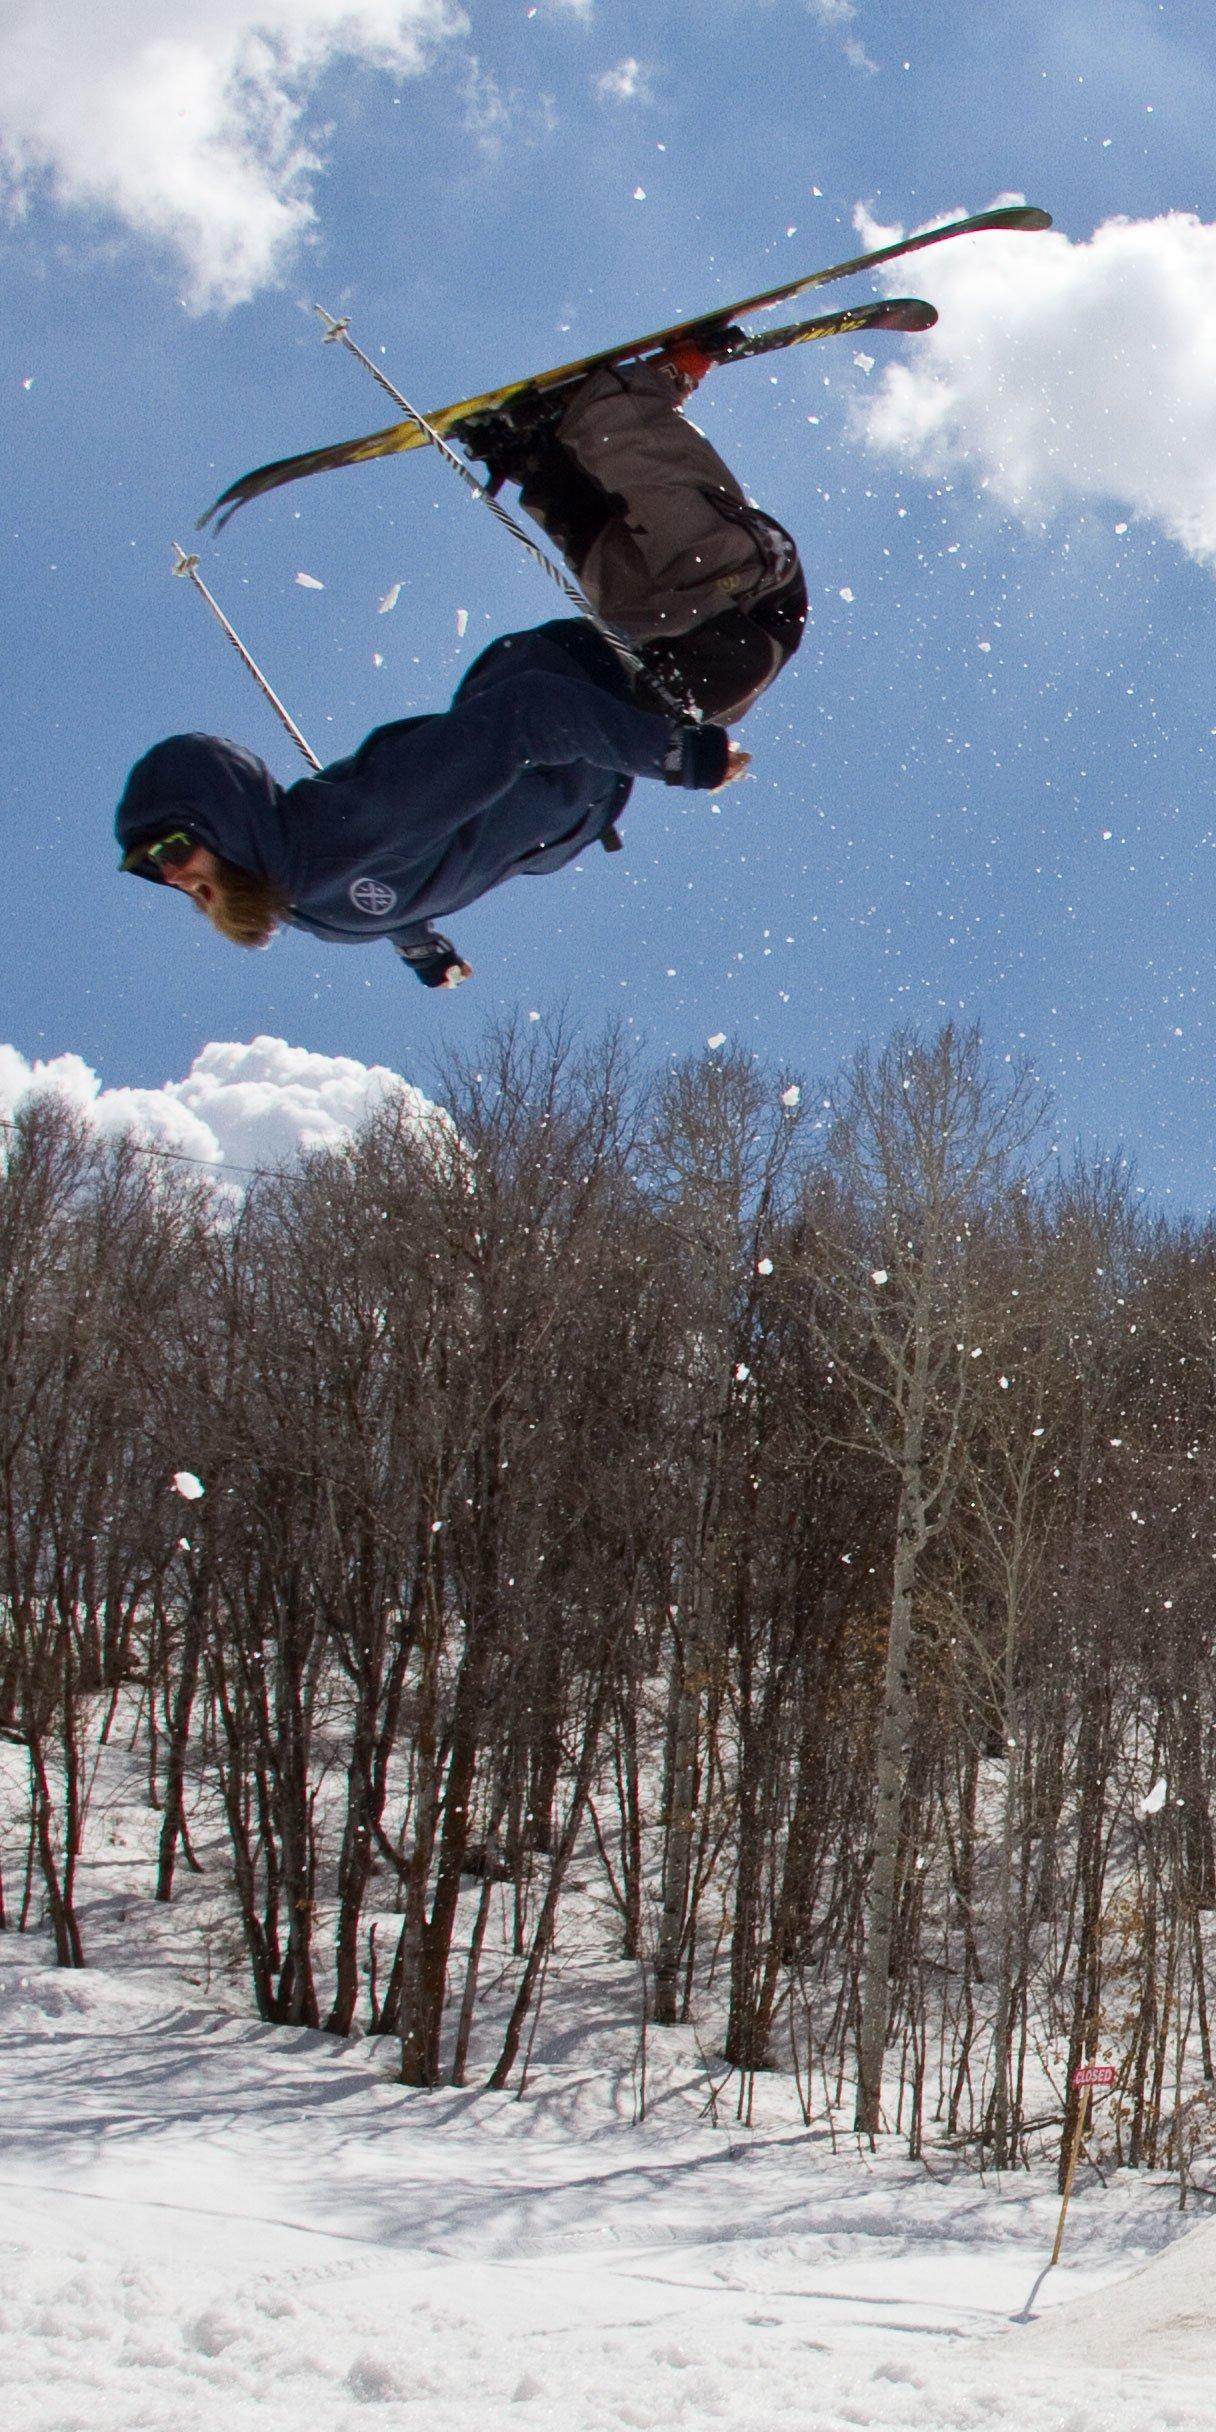 Witt Foster Beard Flip at the Line Skis Shoot